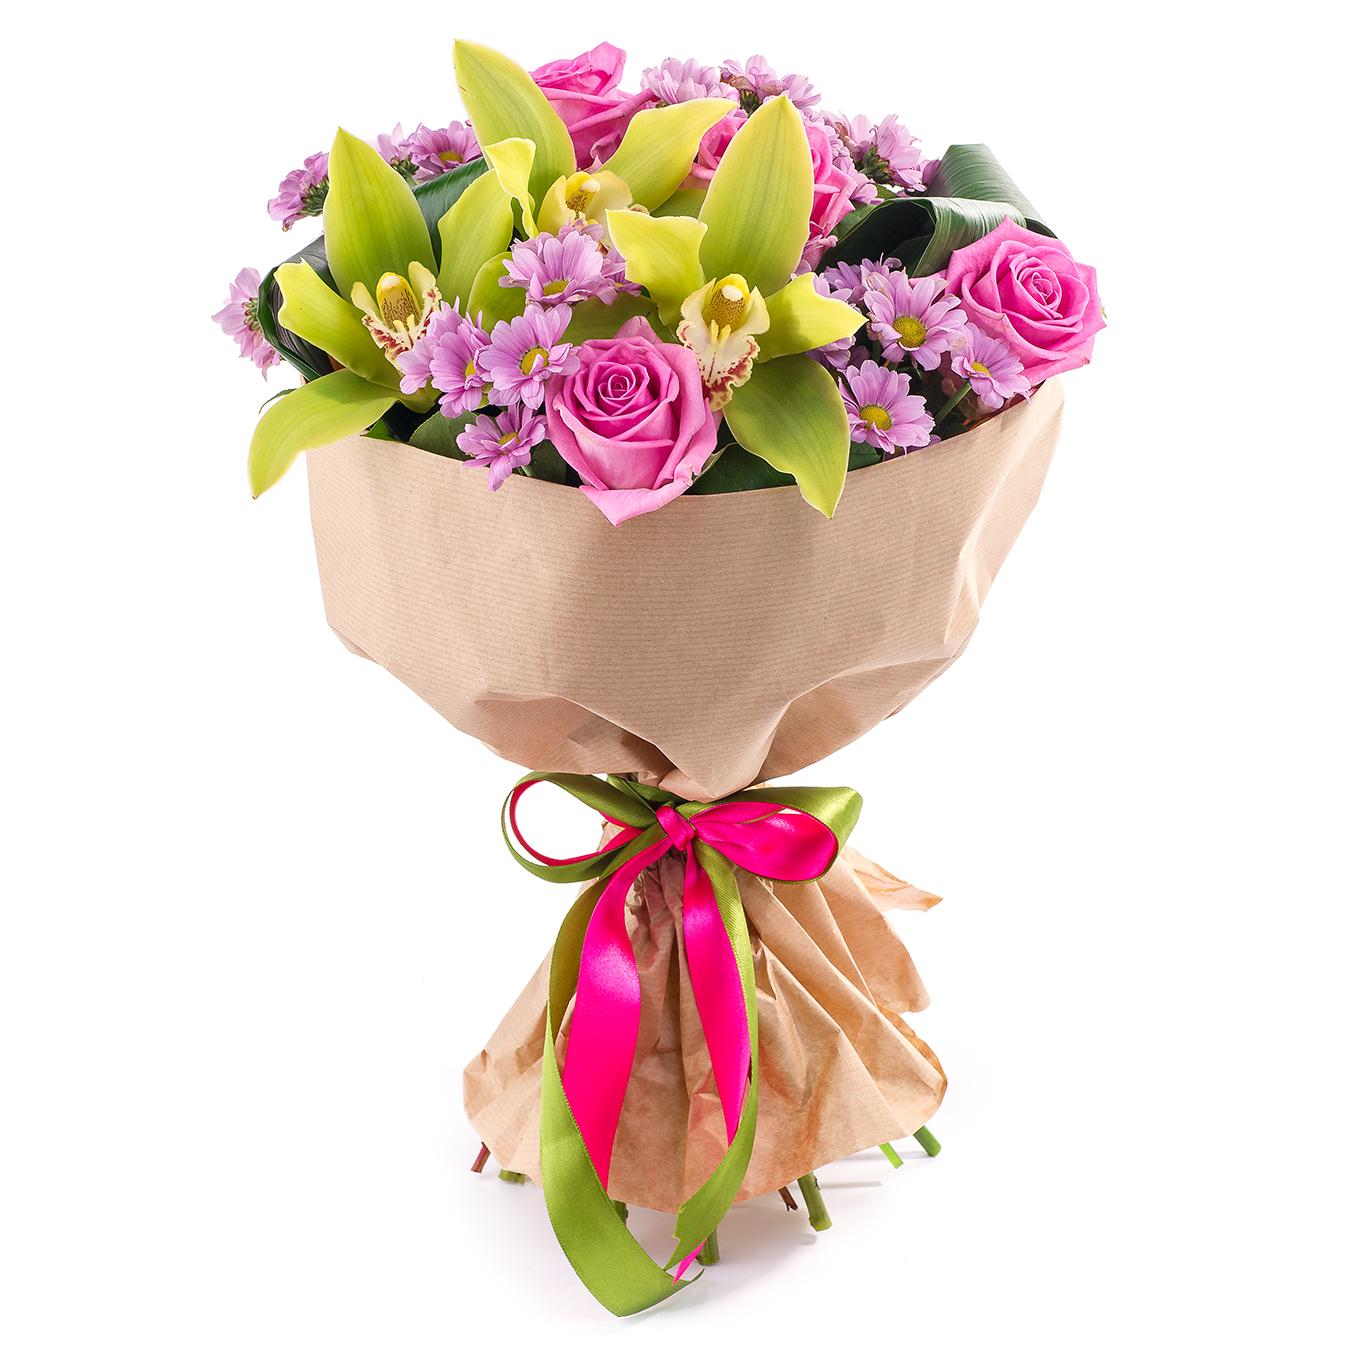 Мотылёк<br>Ингредиенты: Роза (50 см) 5 шт, Цимбидиум 3 шт, Хризантема кустовая 4 шт, Аспидистра 2 шт, Салал, Крафт 1 шт;